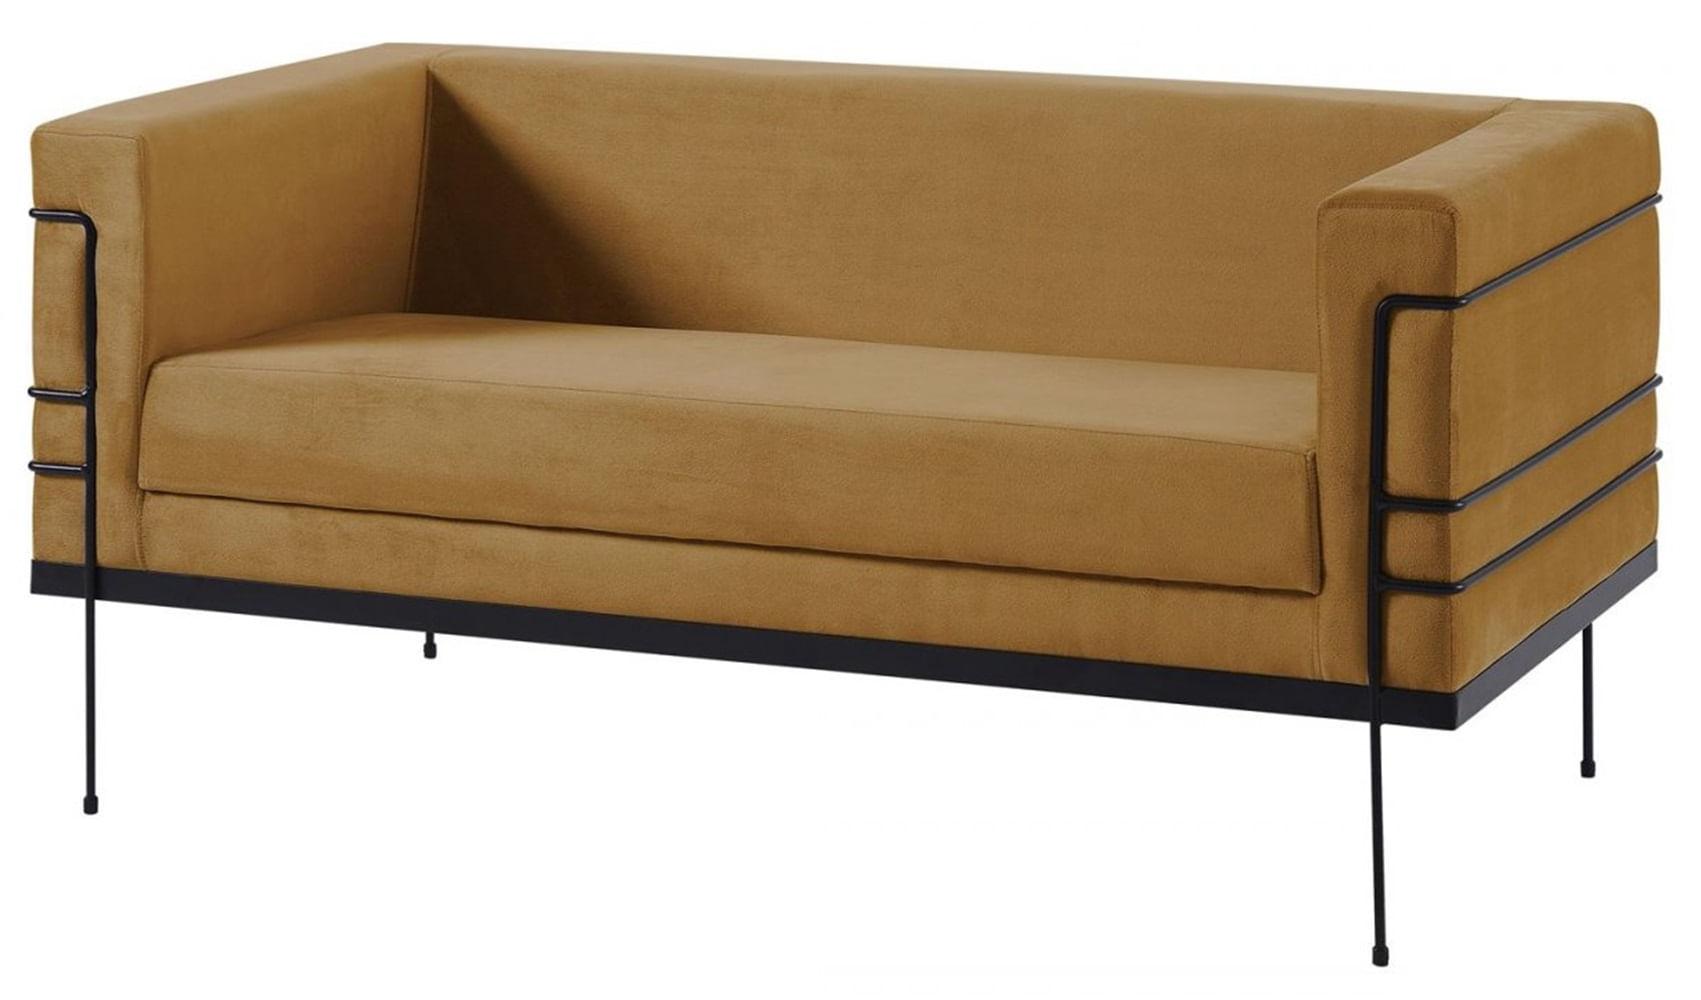 Sofa Le Corbusier Caramelo Base Aco Preto 2 Lugares - 50362